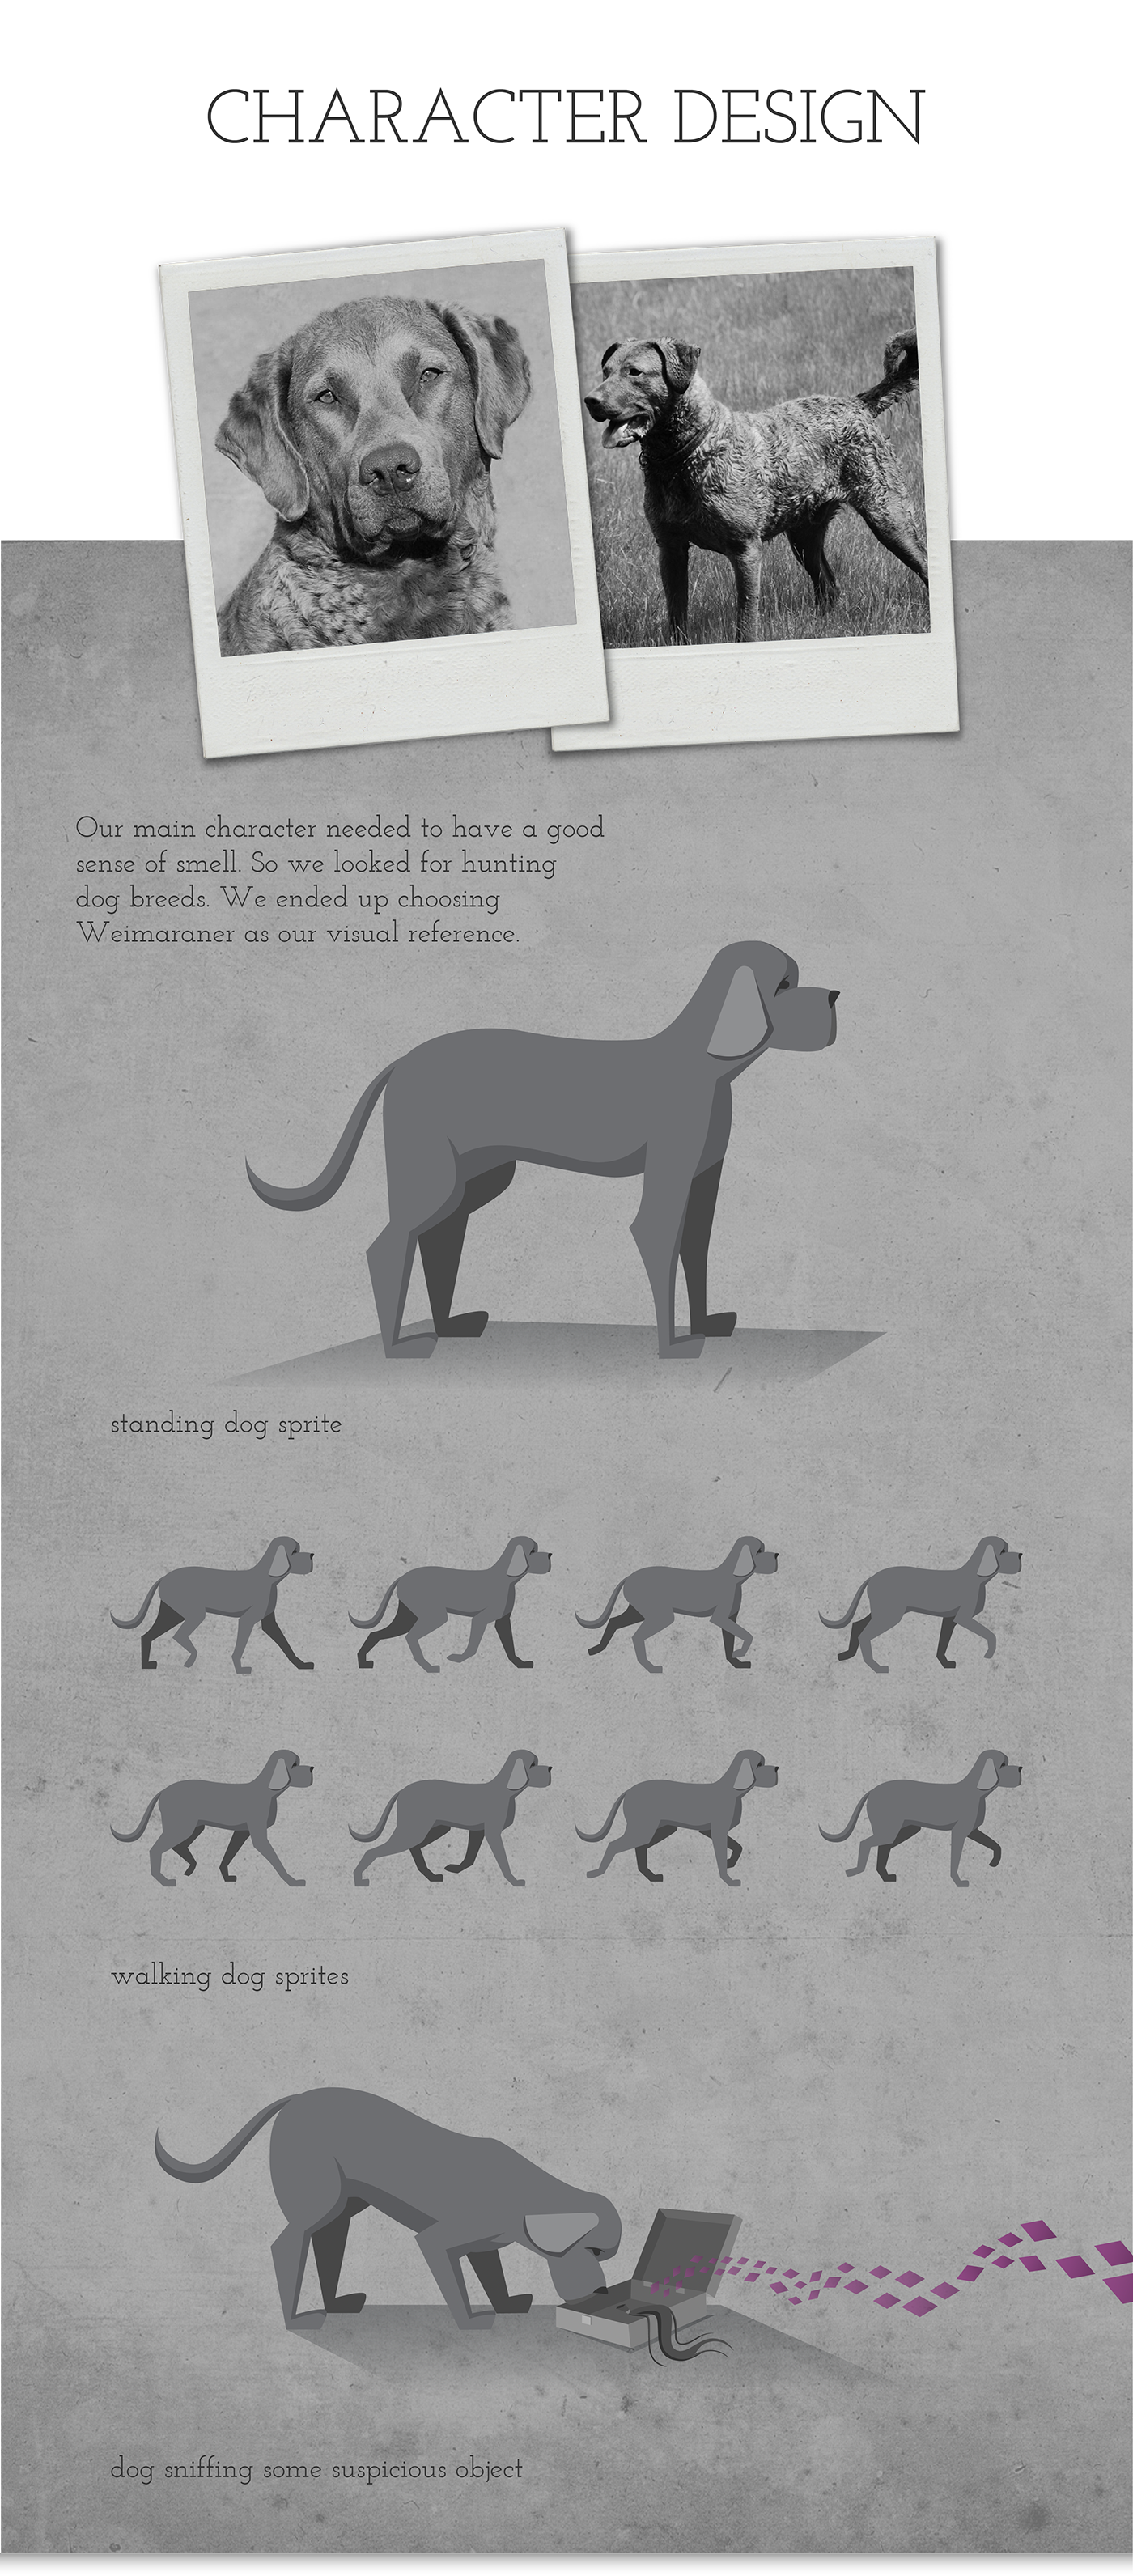 game design  game noir mystery narrative narrative game dog black and white 2d game adobeawards